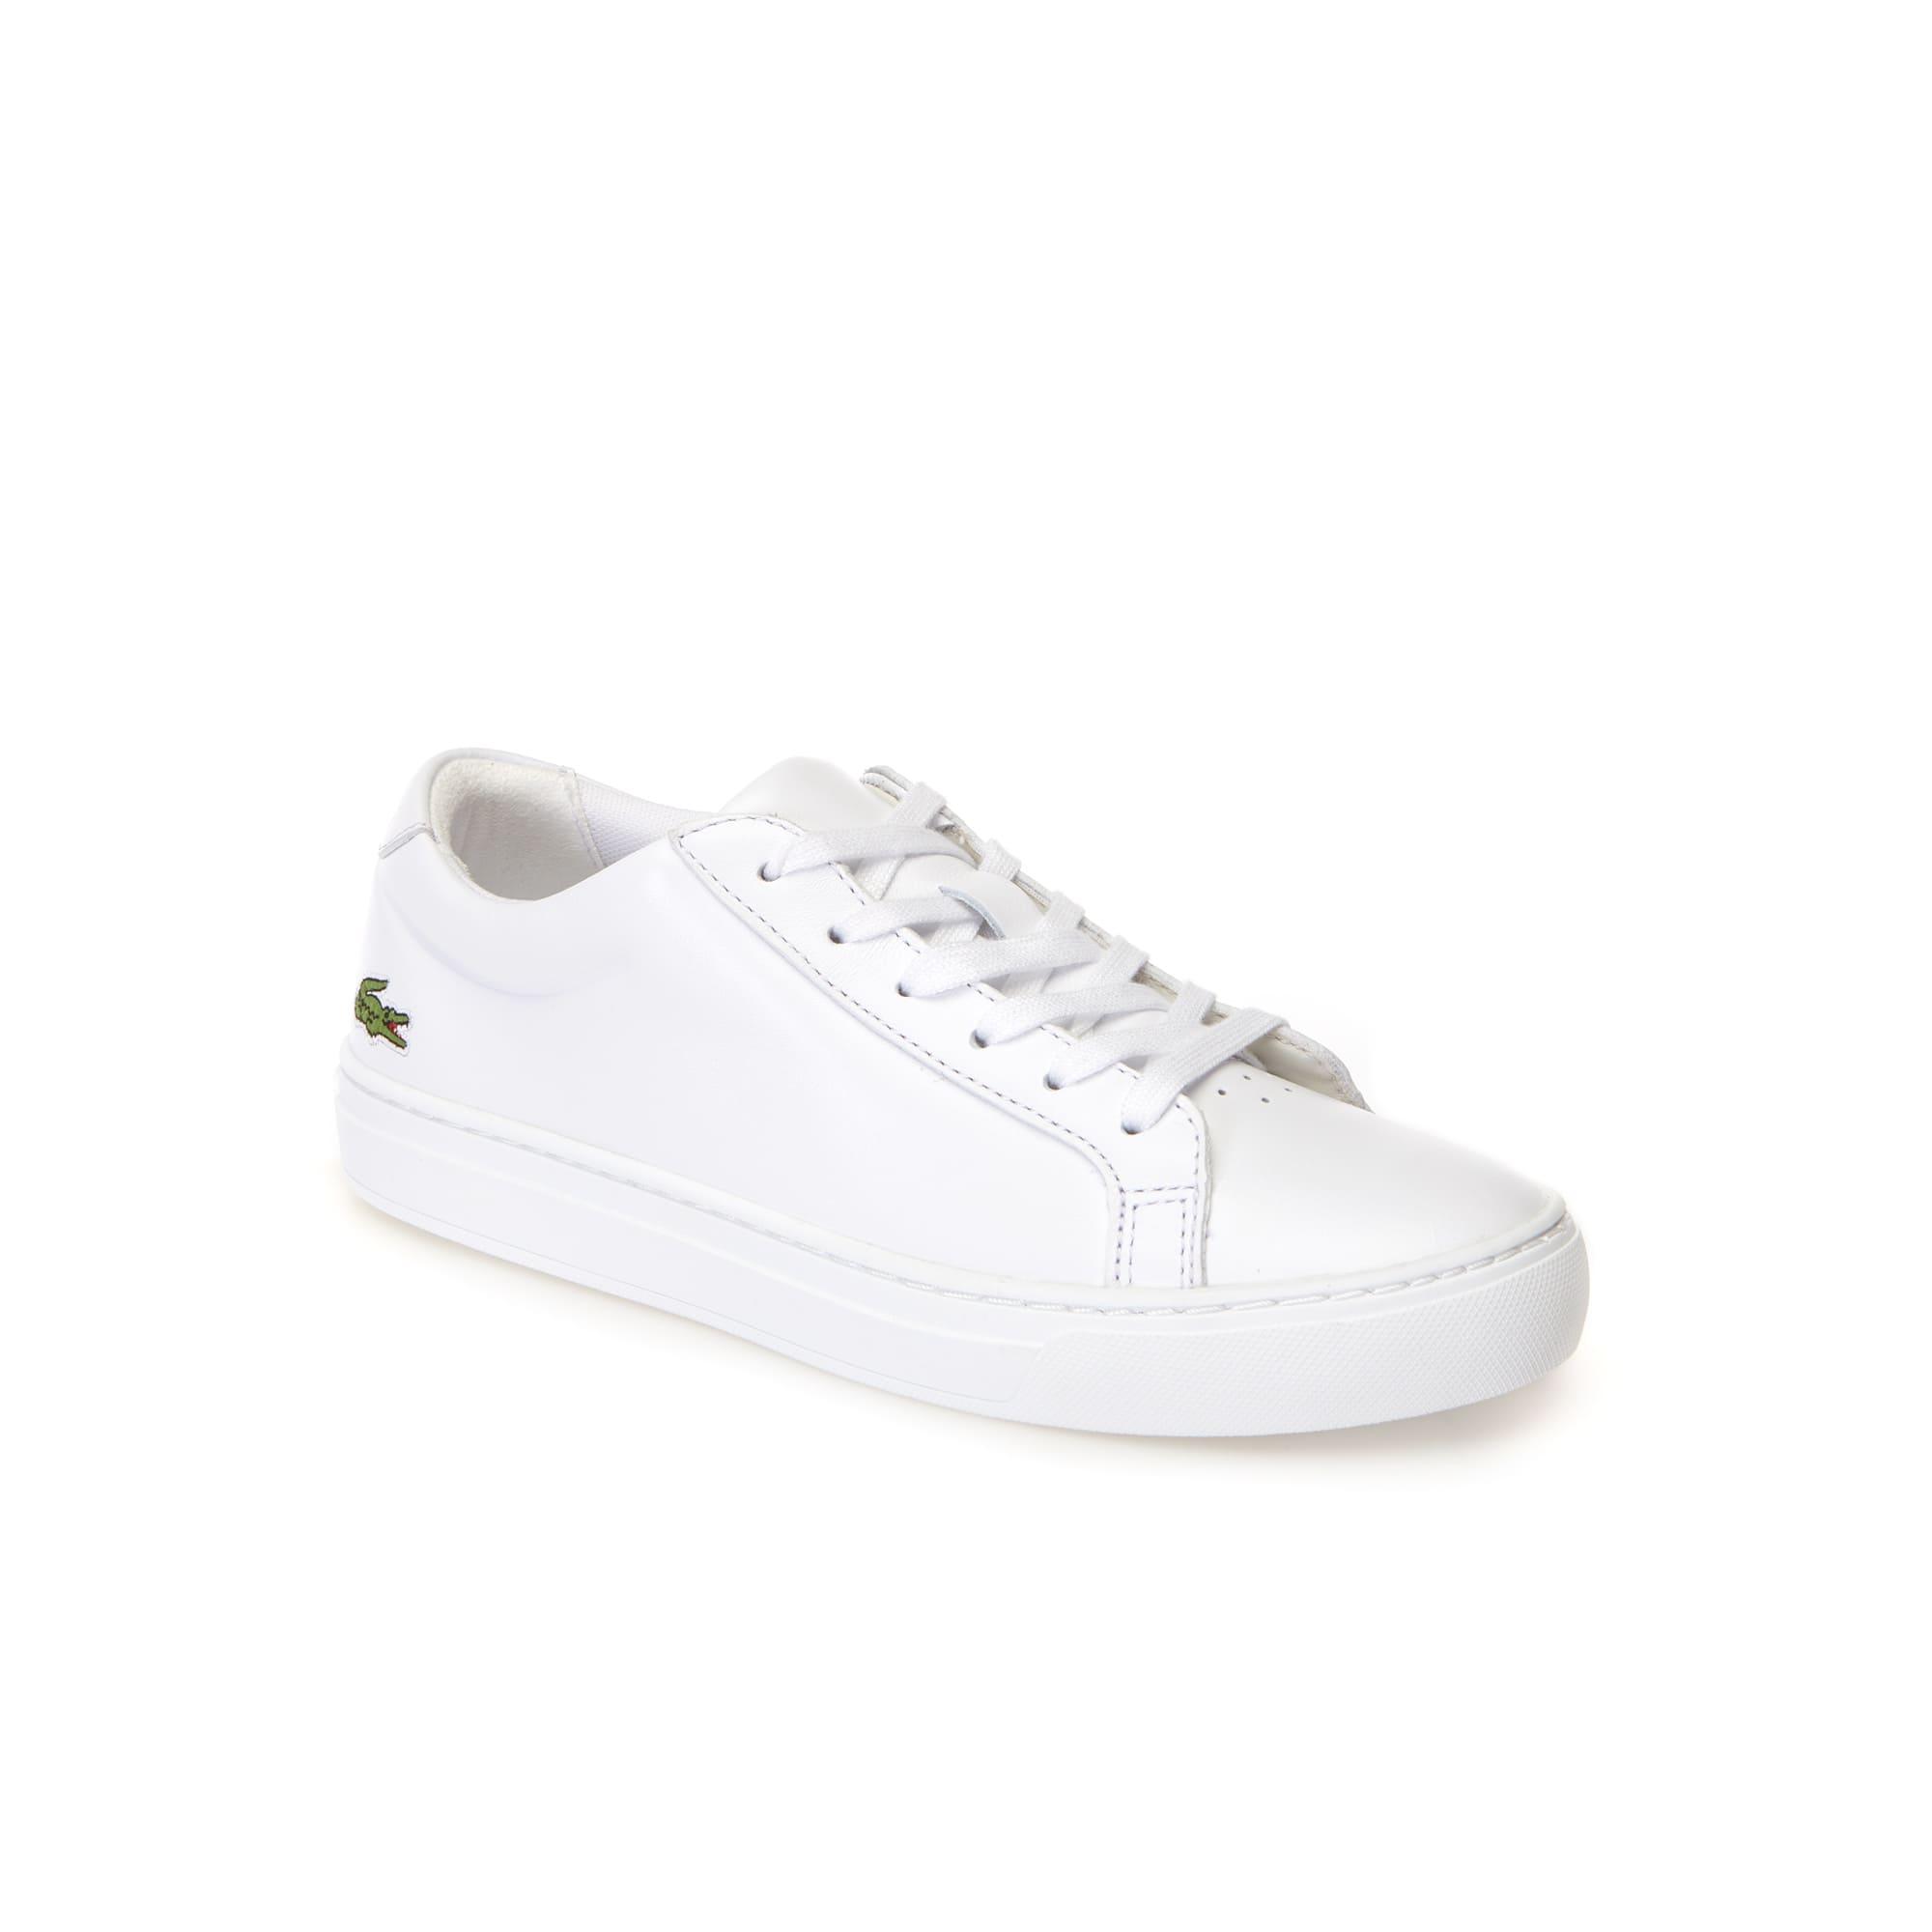 Sneakers L.12.12 in nappa premium